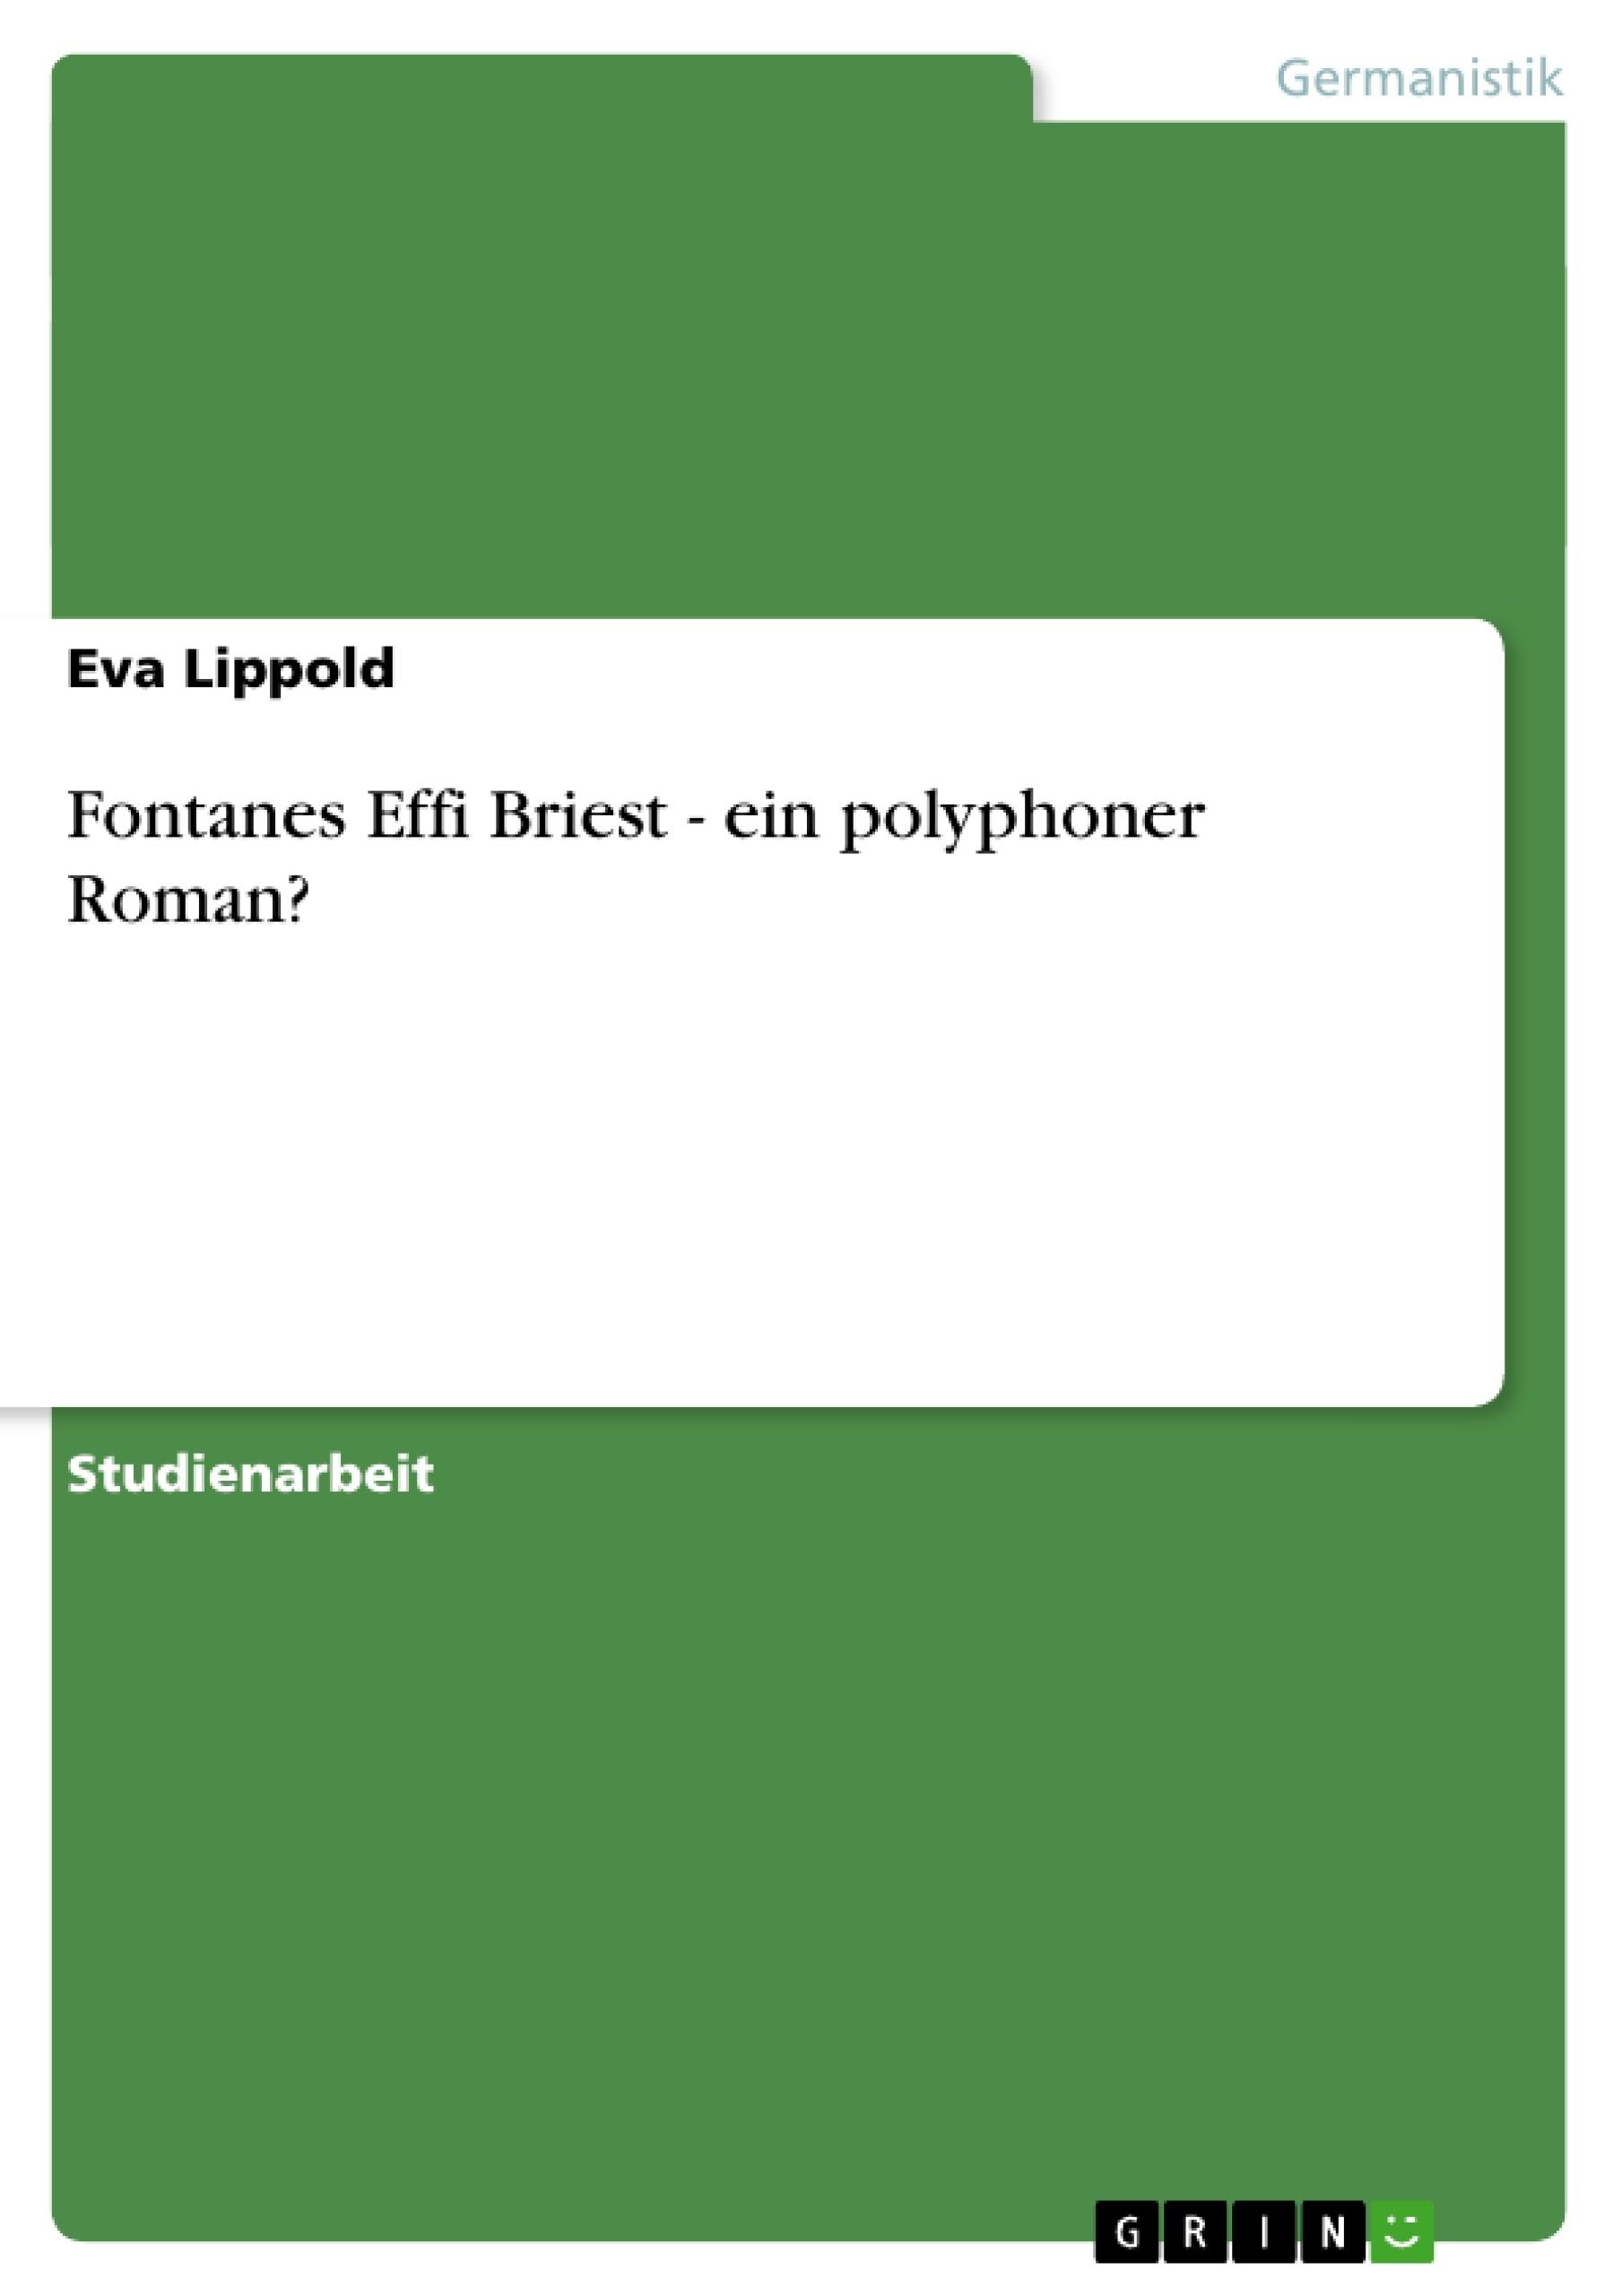 Titel: Fontanes Effi Briest - ein polyphoner Roman?